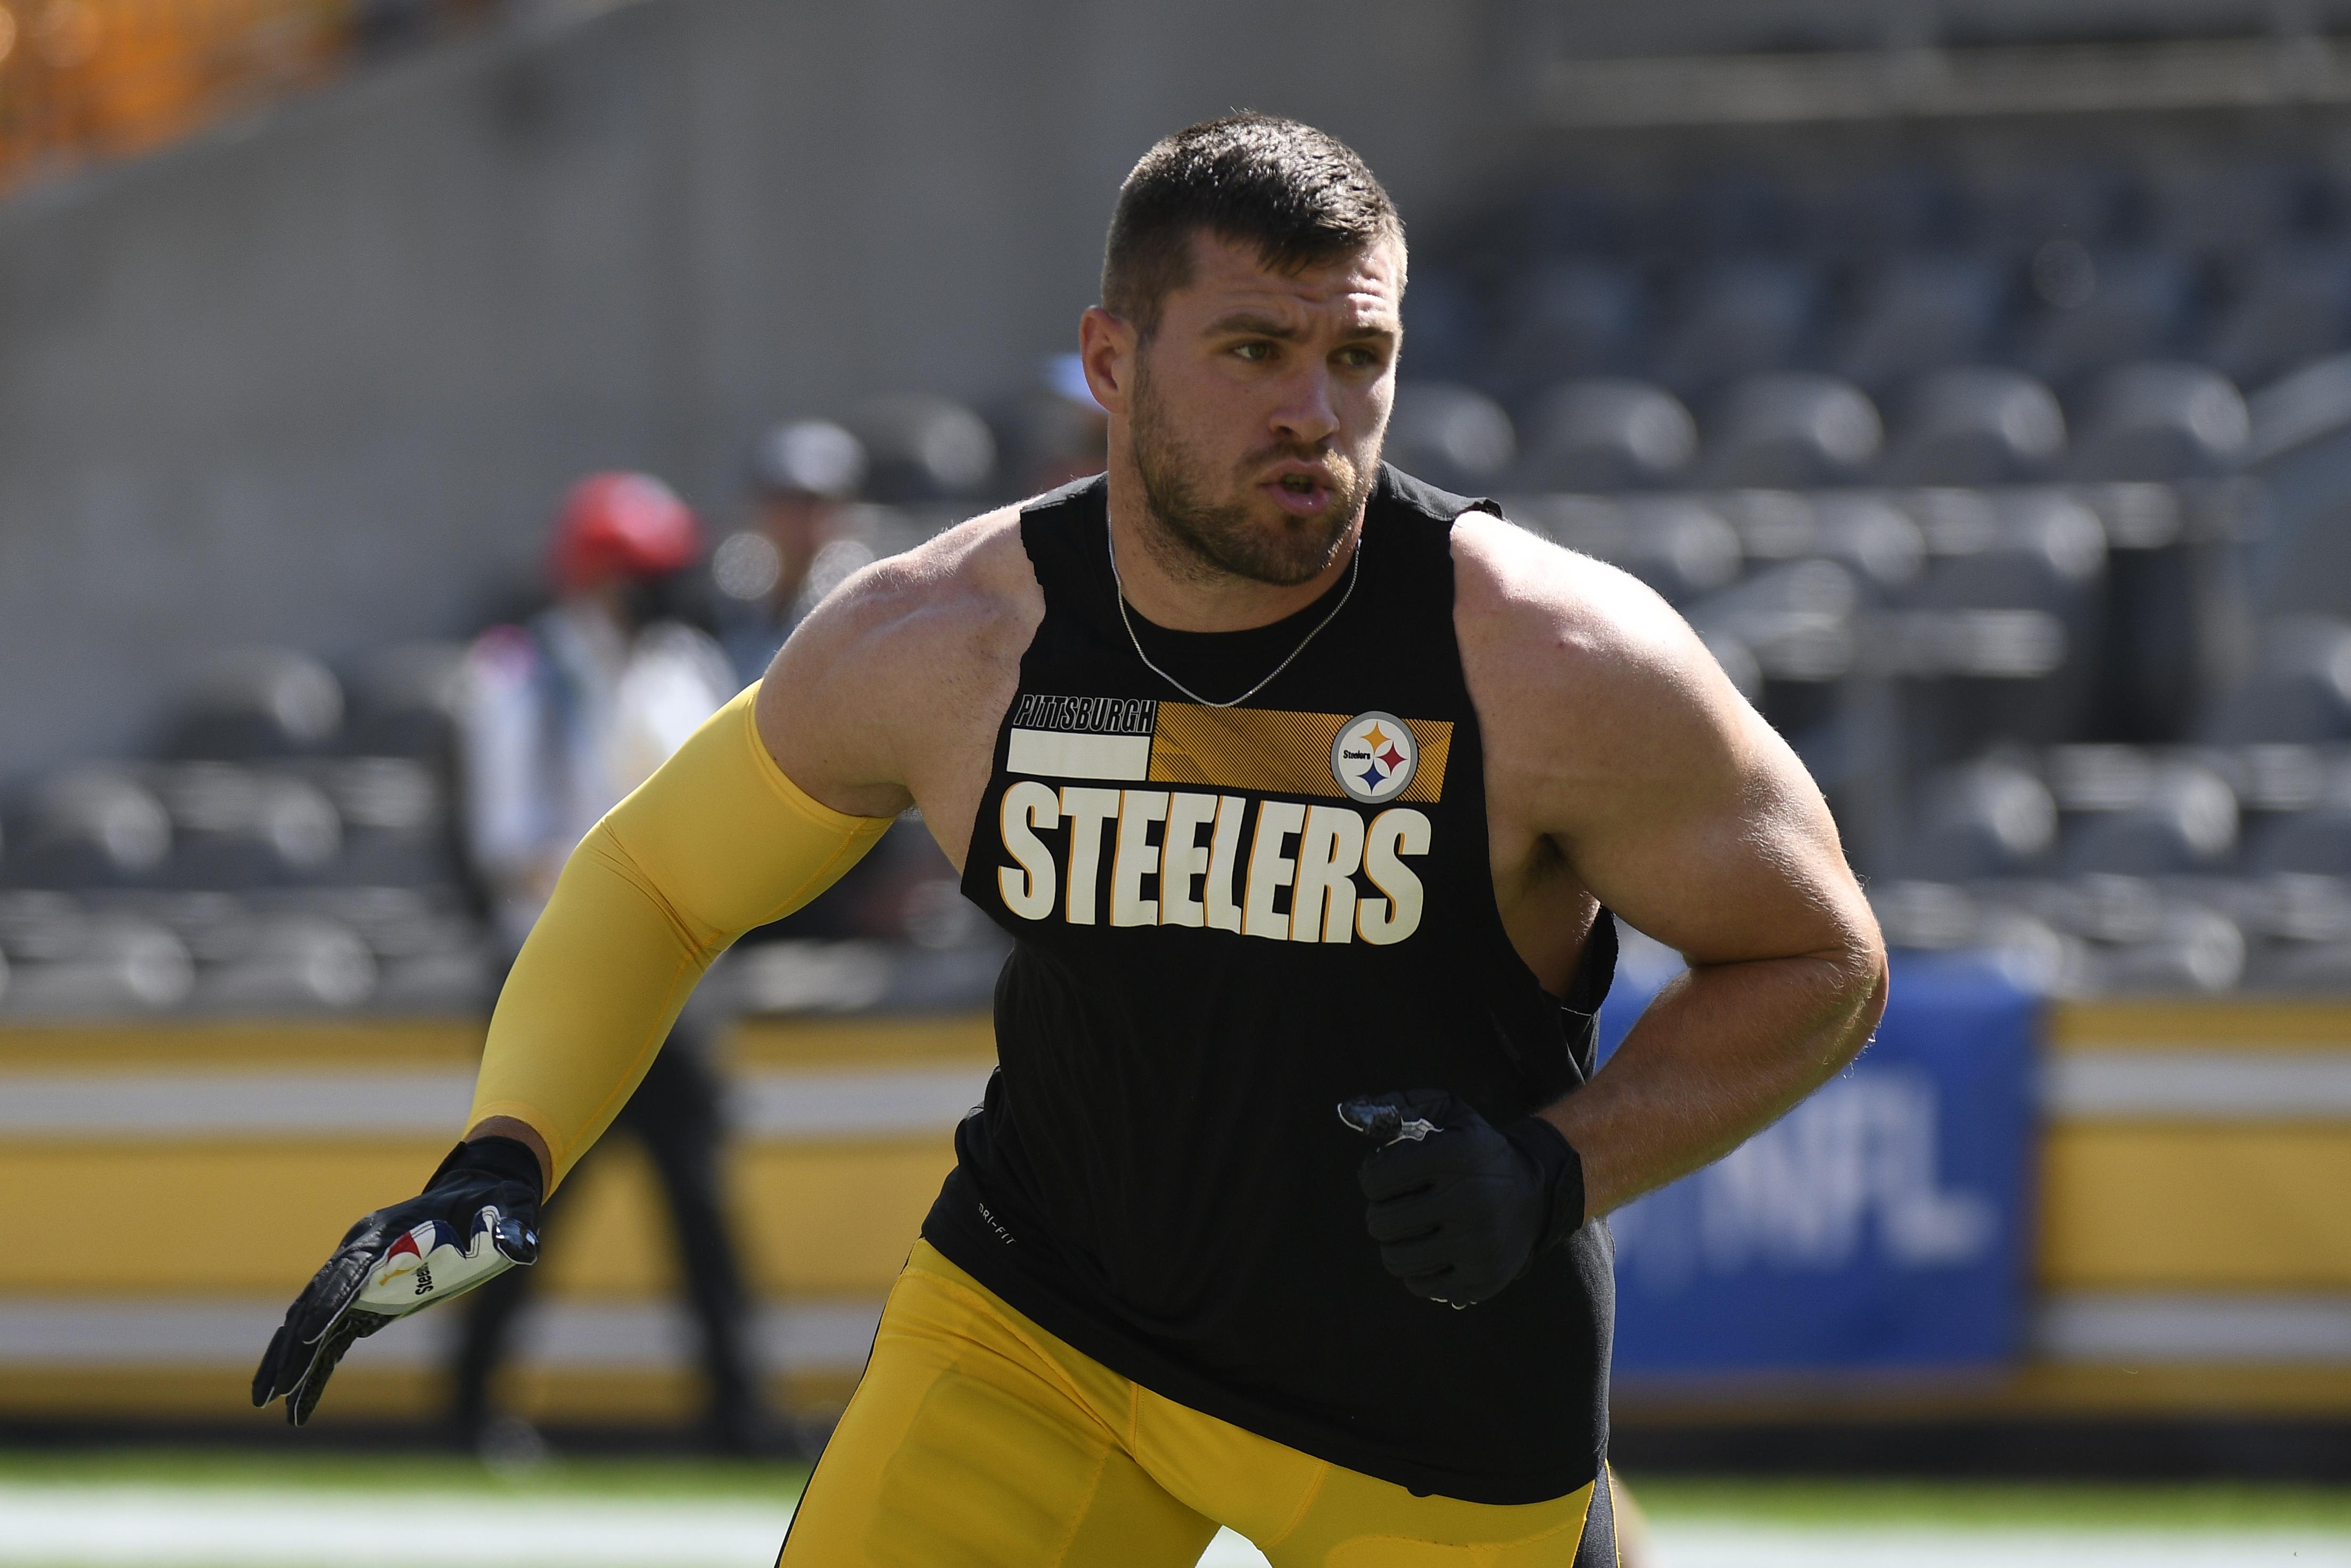 Steelers' T.J. Watt Won't Play vs. Bengals Because of Groin Injury